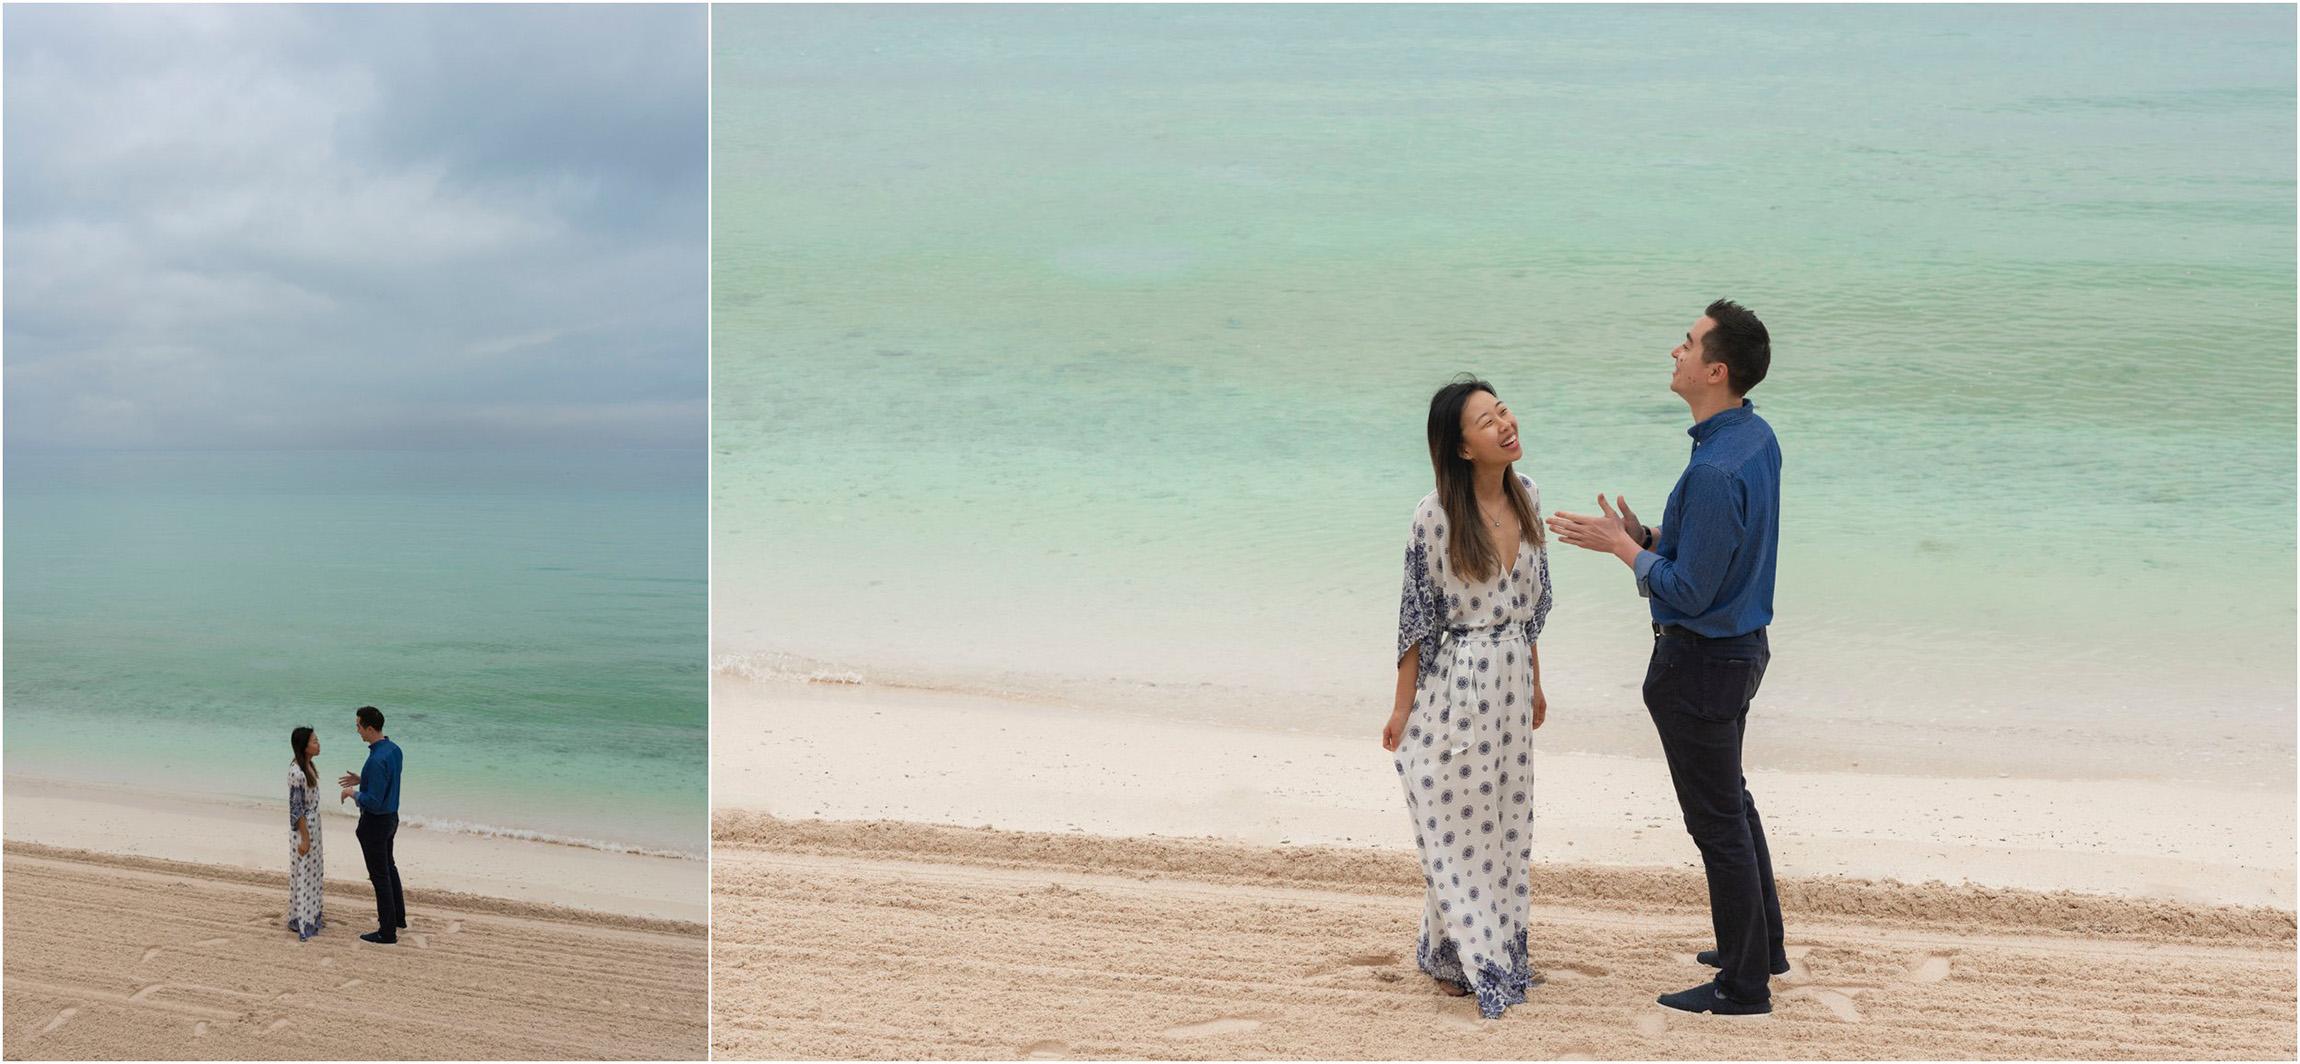 ©FianderFoto_Bermuda Proposal Photographer_Cambridge Beaches_Mason_003.jpg